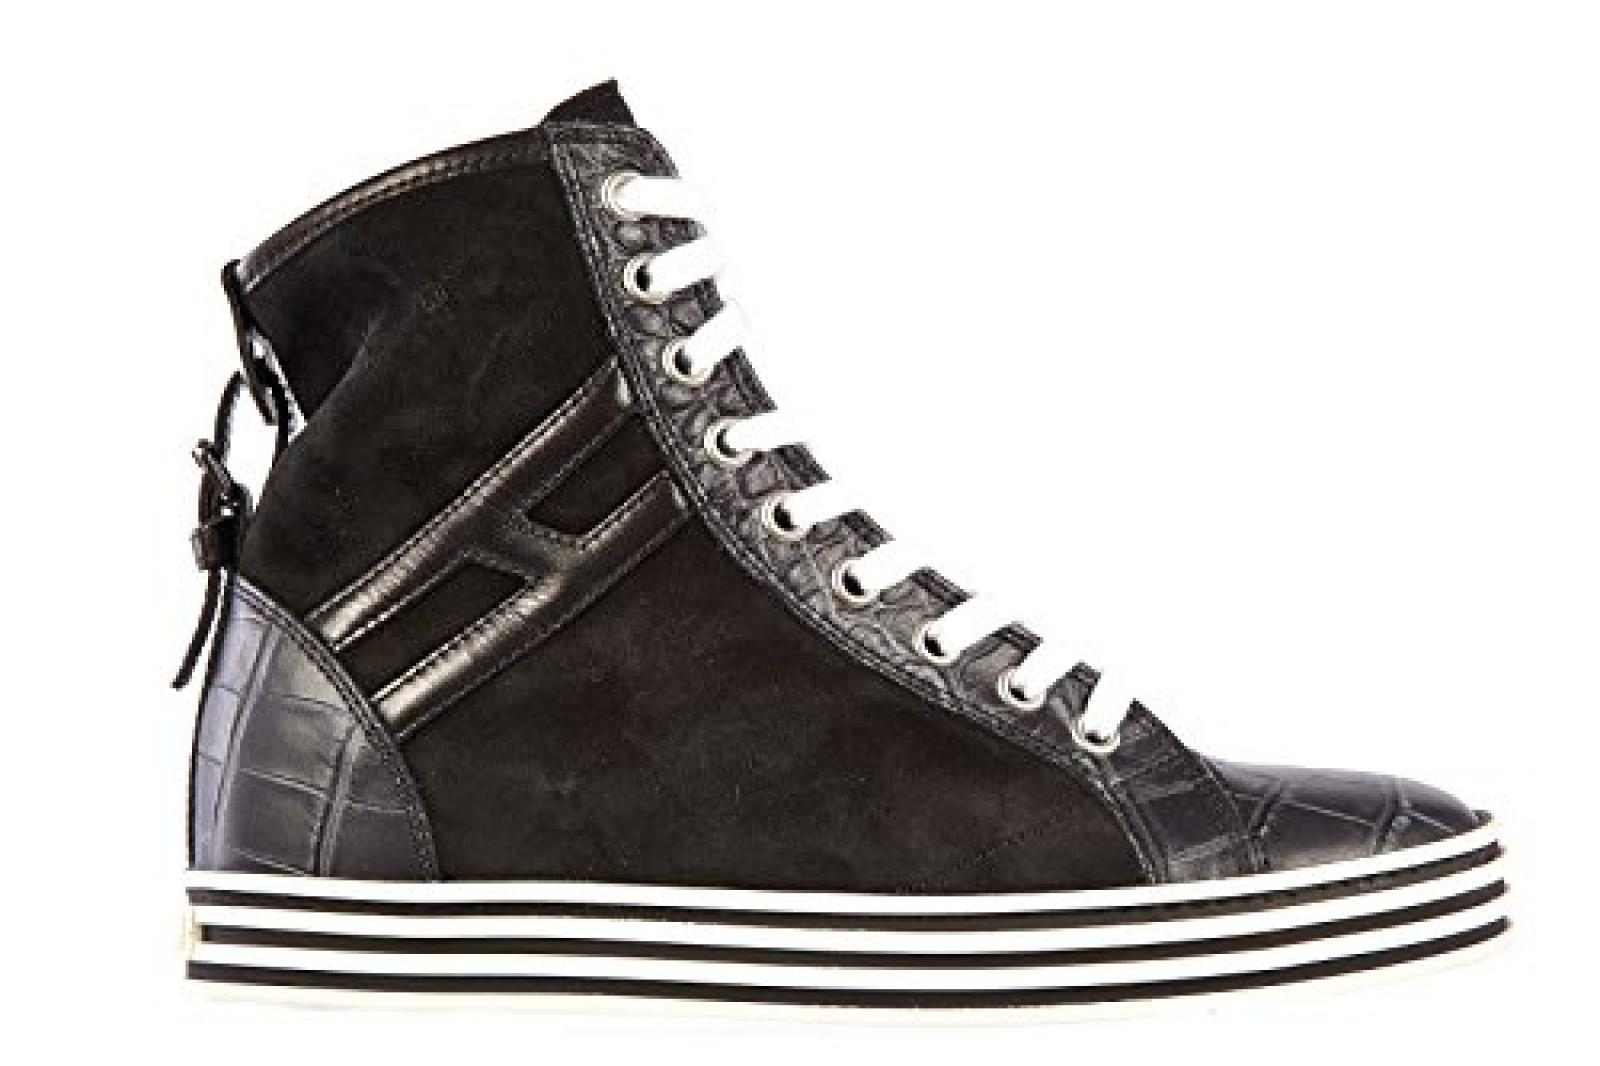 Hogan Damenschuhe Damen Leder Schuhe High Sneakers r182 rebel Schwarz